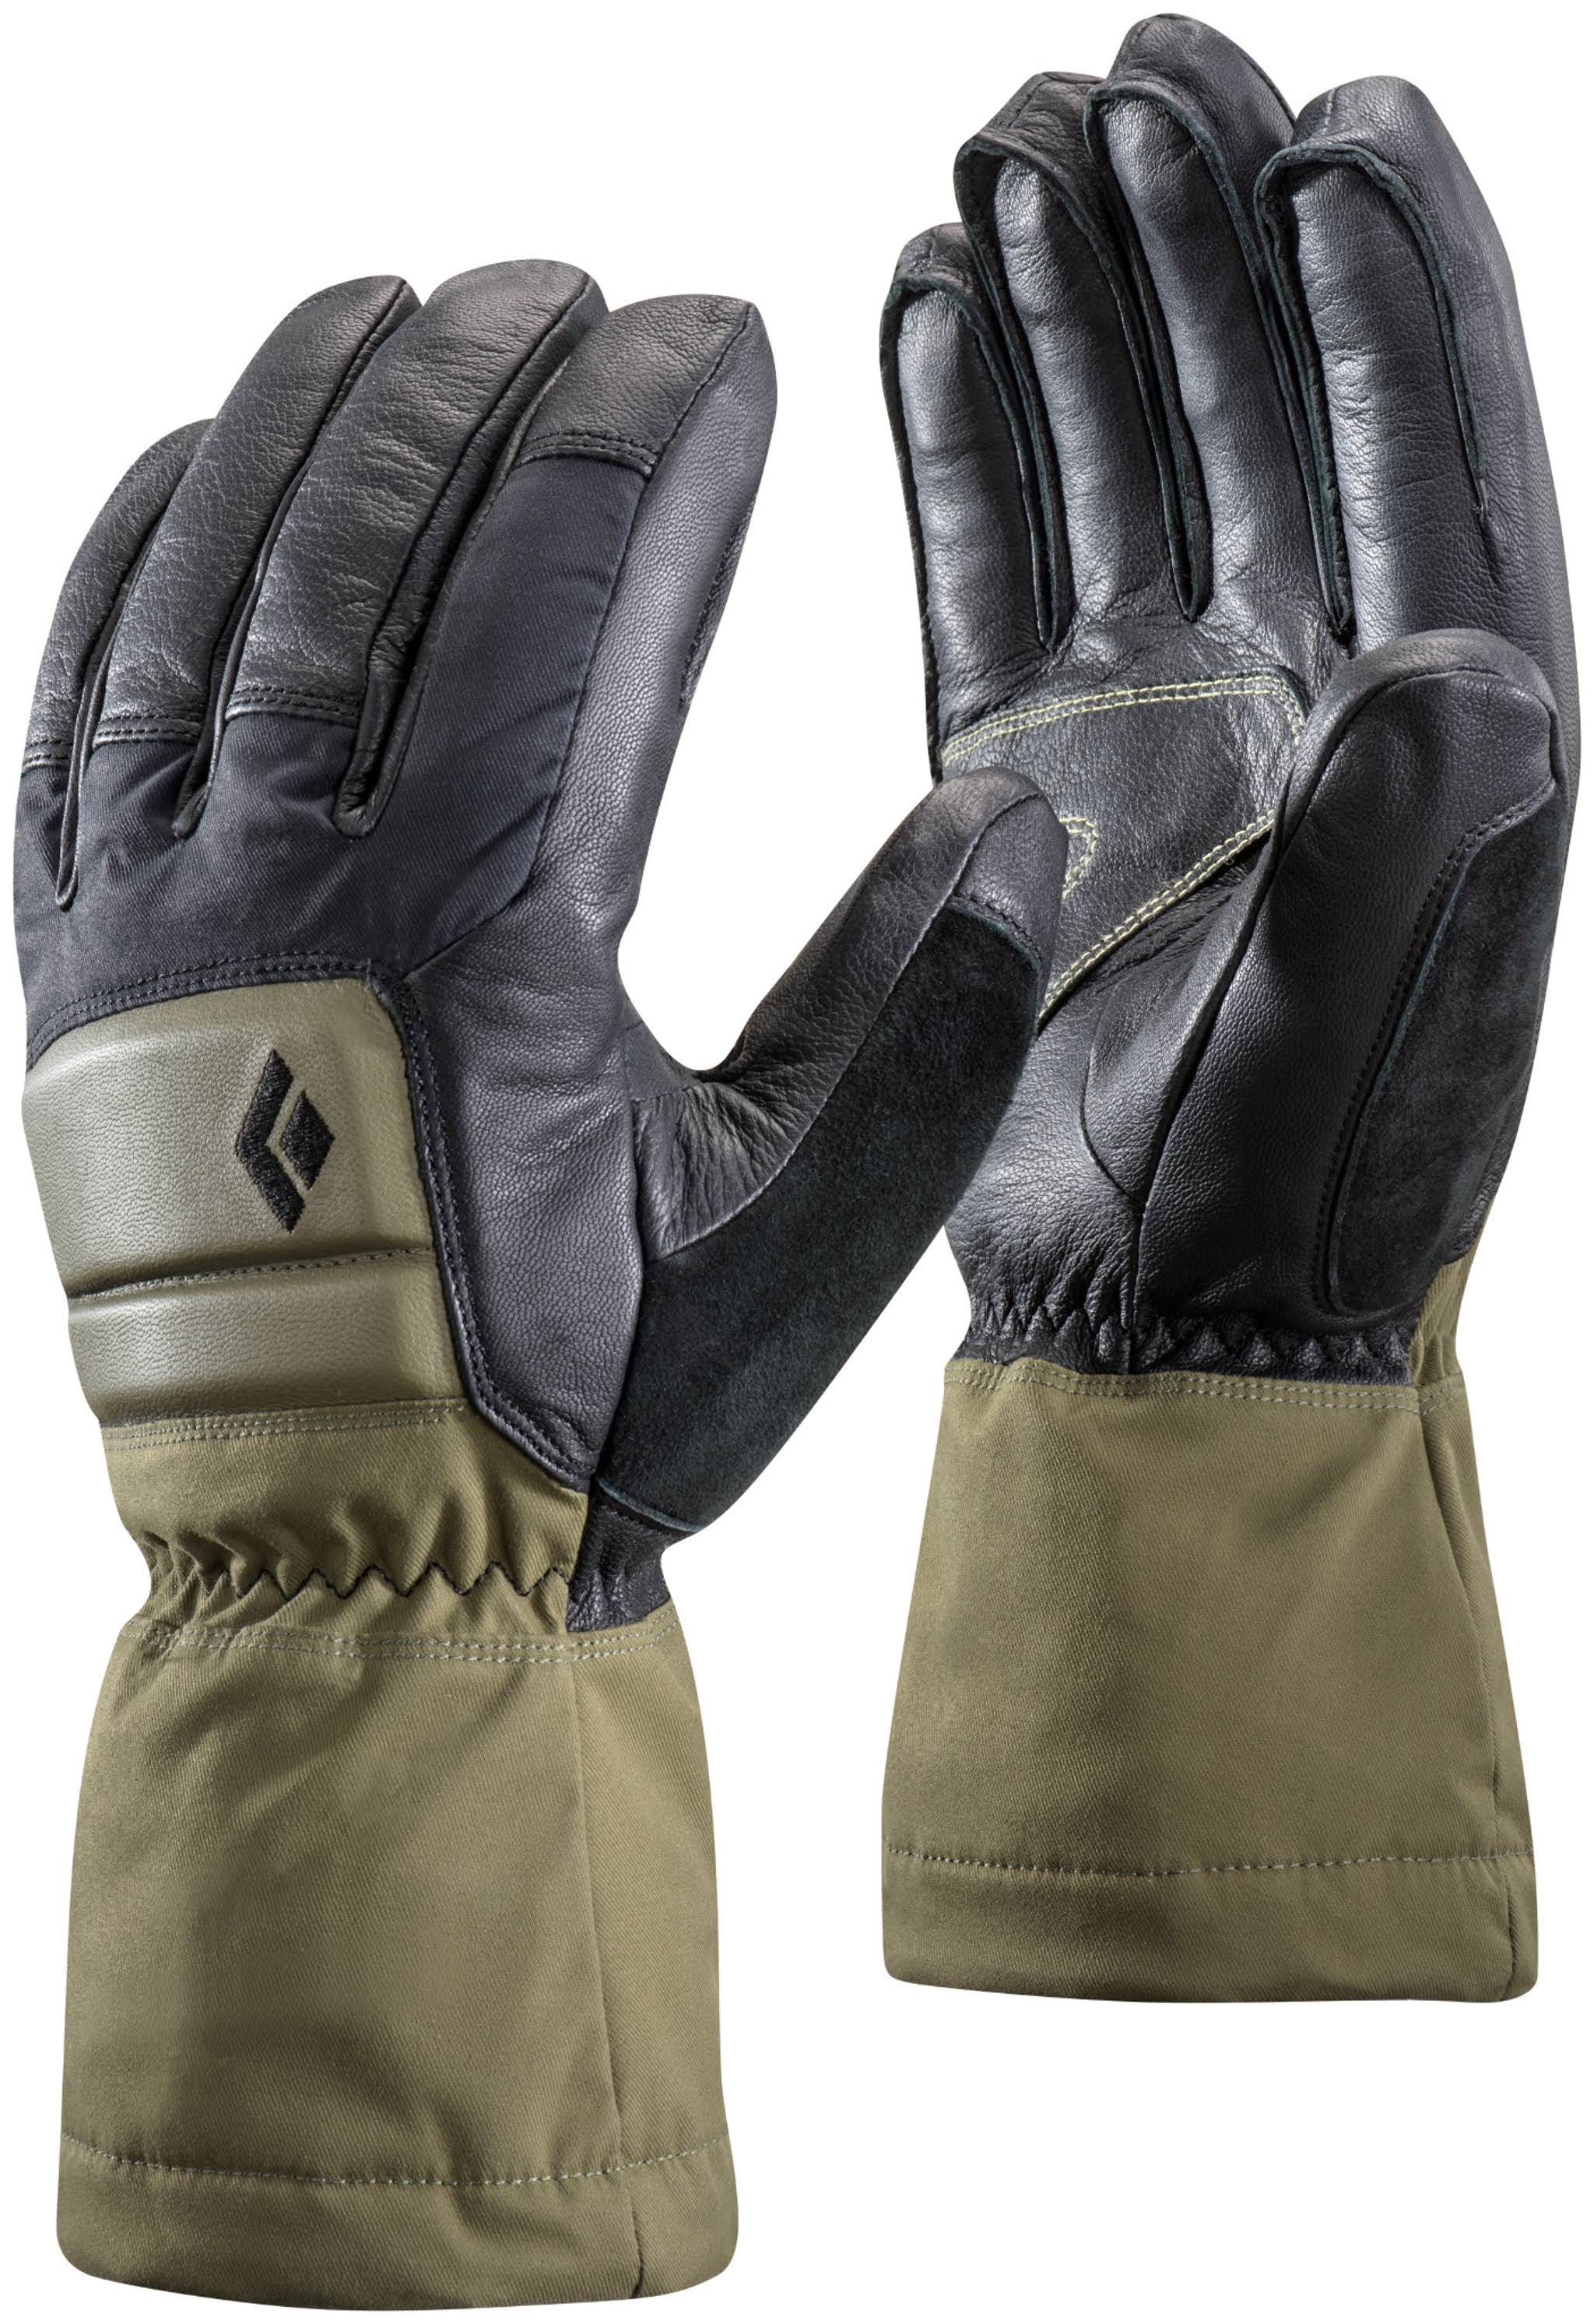 Black Diamond Spark Powder Gloves Men's Medium Burnt Olive